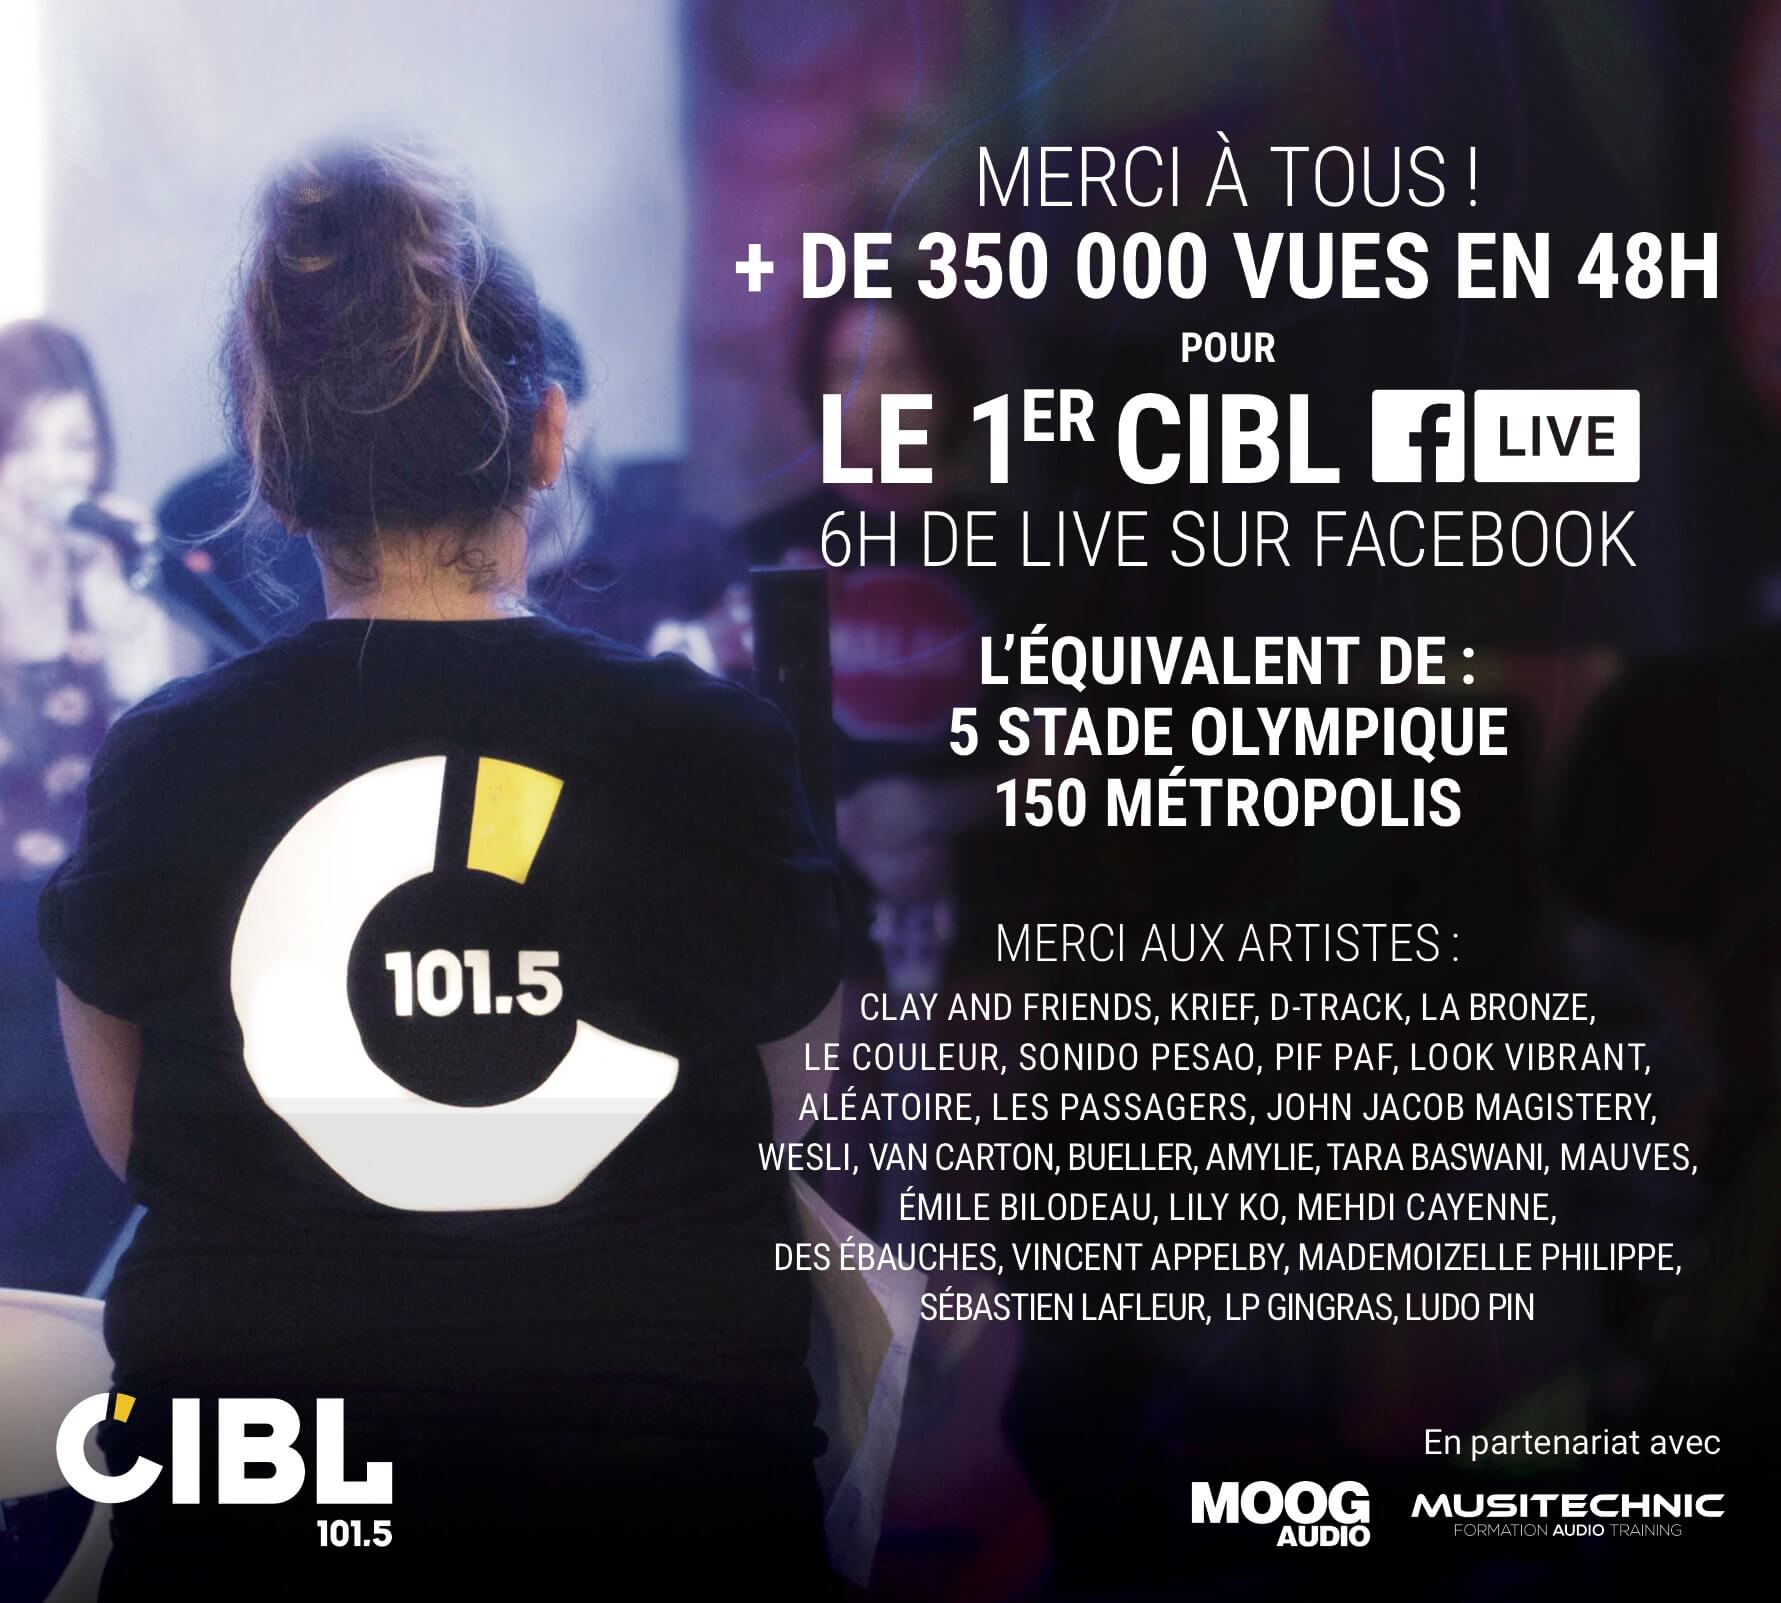 Musitechnic fier partenaire du 1er CIBL Facebook Live.